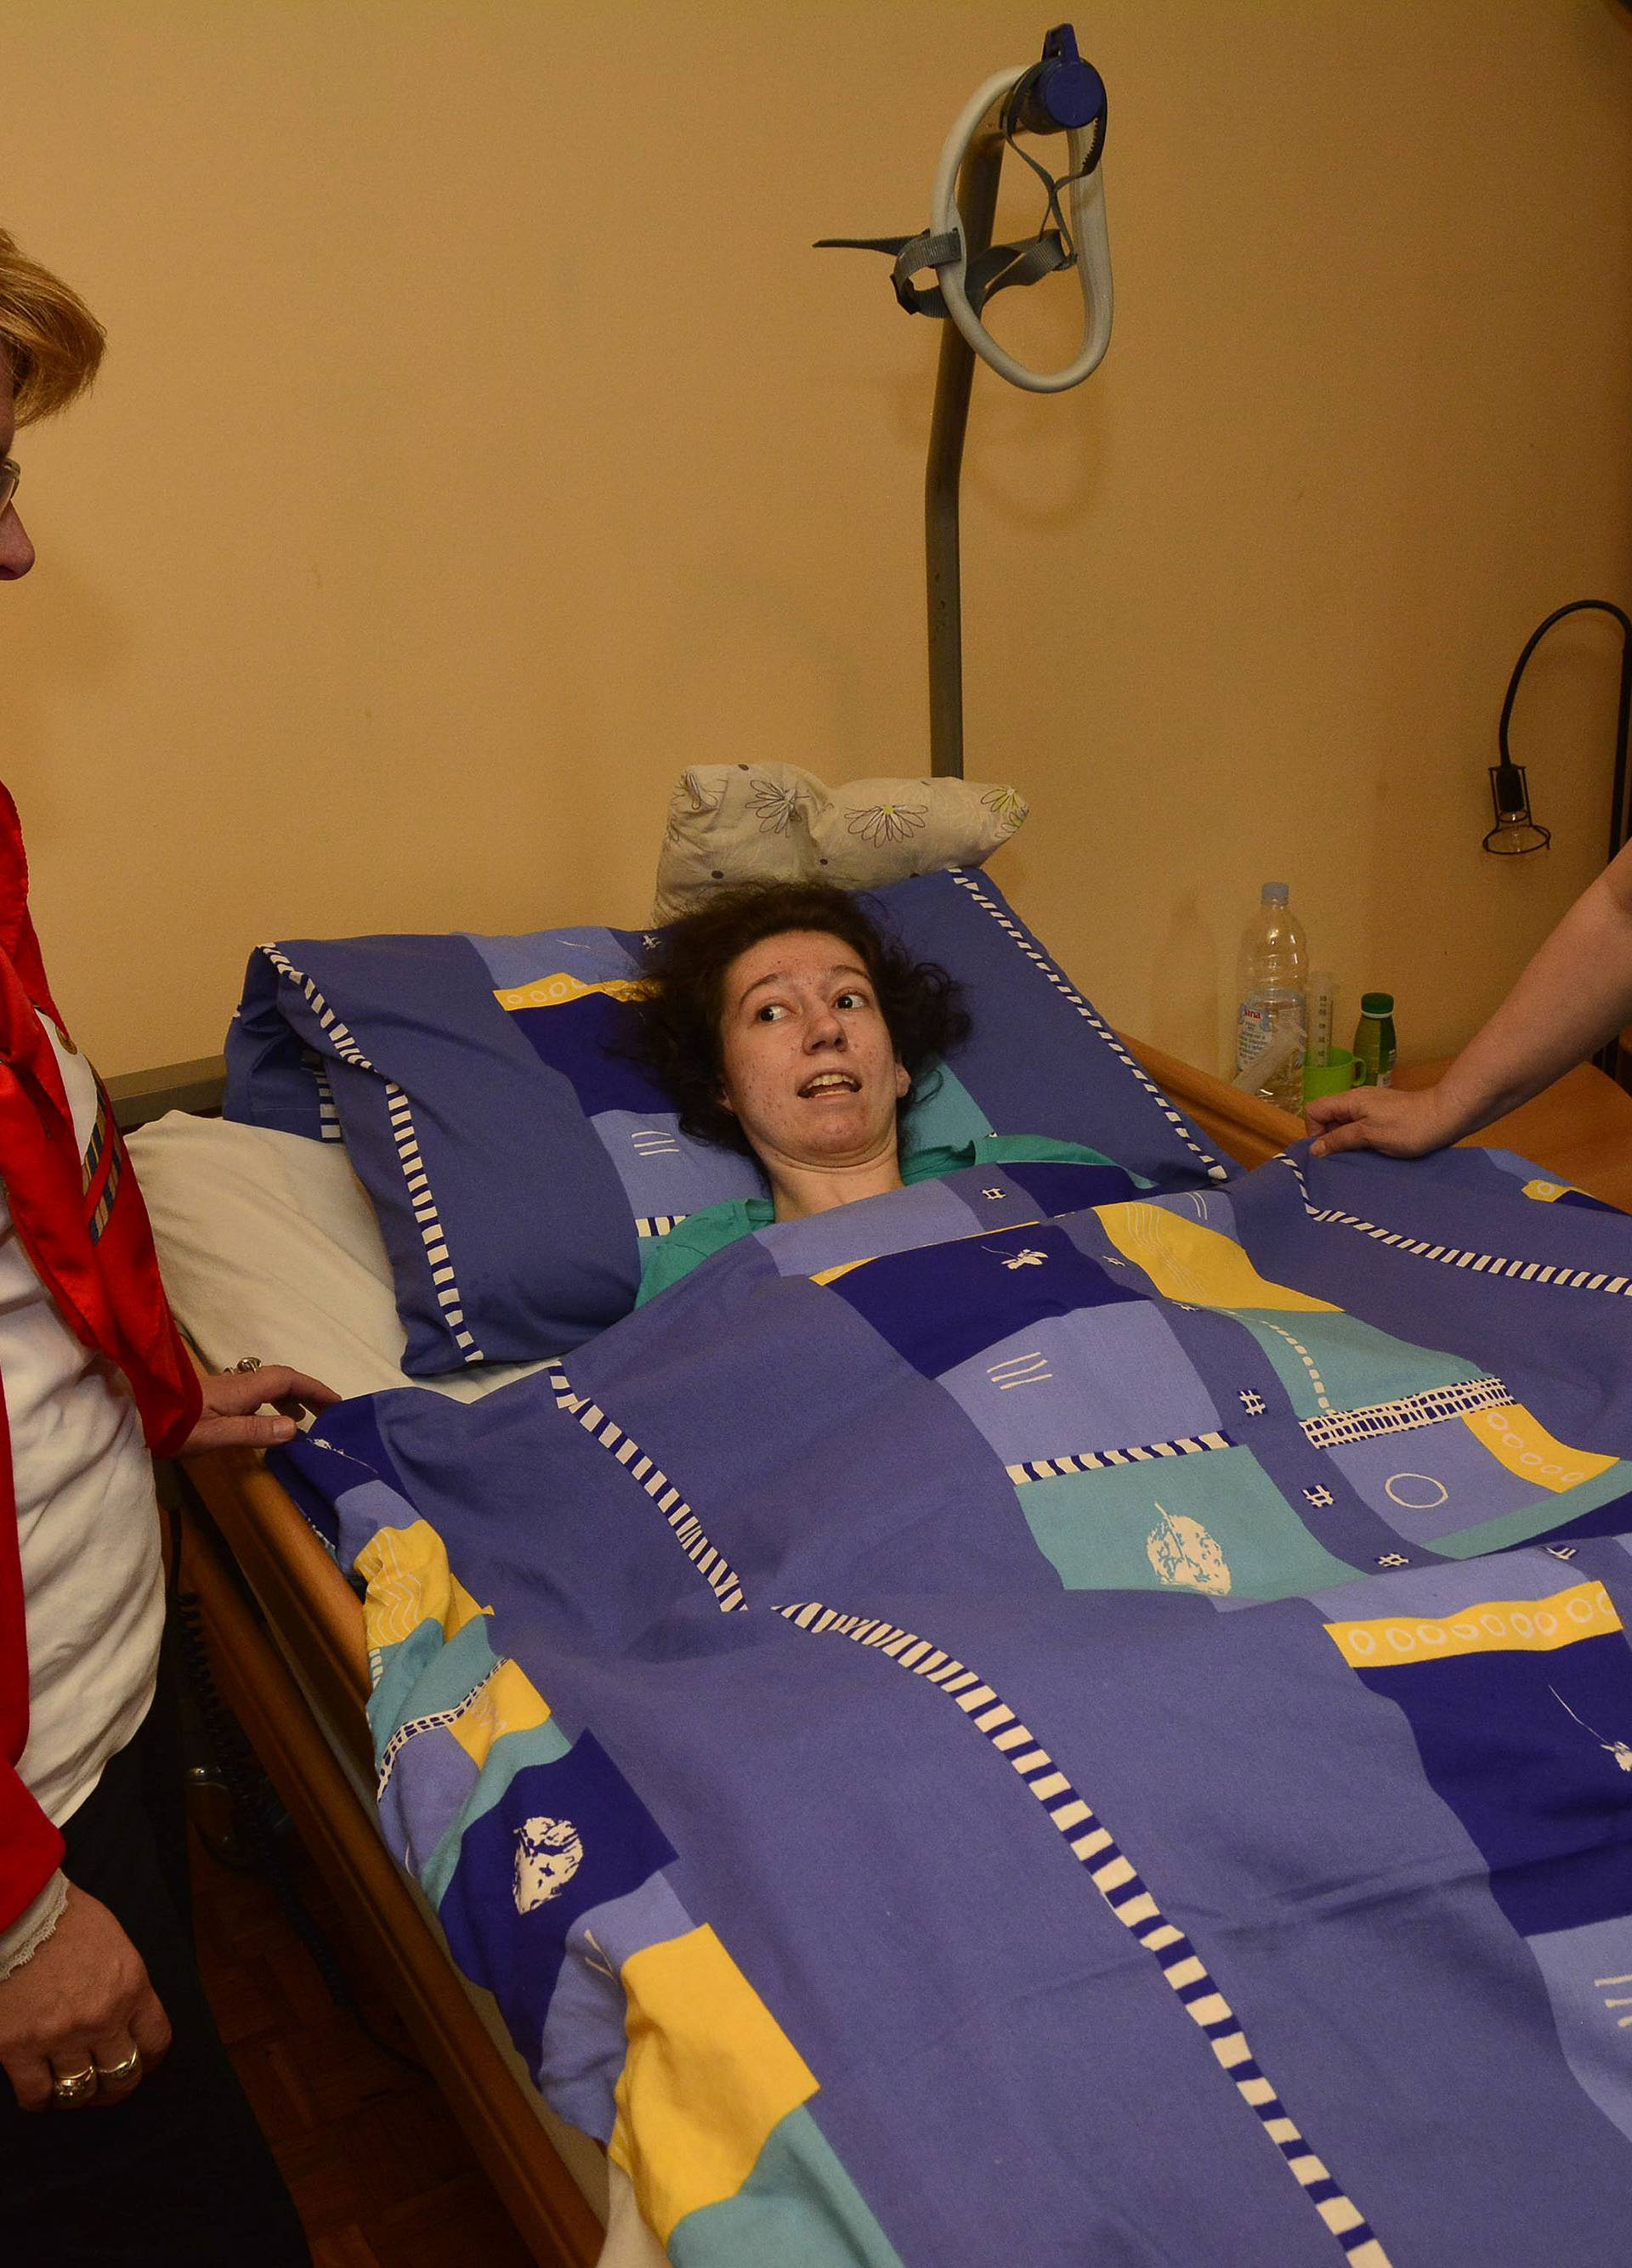 Za teško bolesnu Anitu Herceg ljudi dobra srca skupili donacije